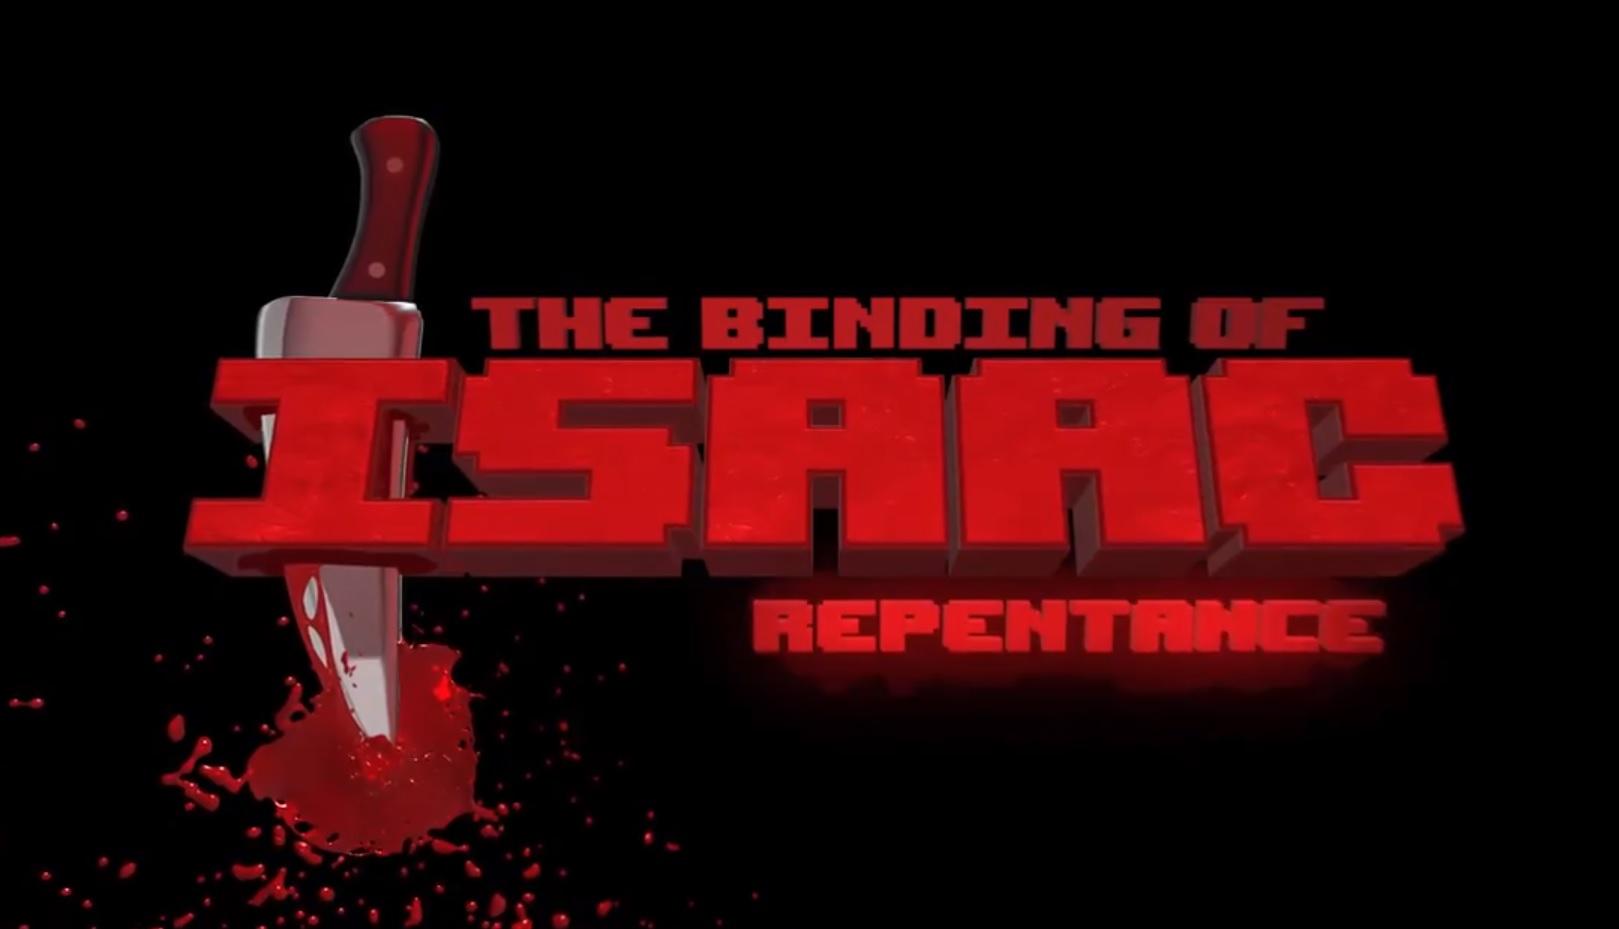 The Binding of Isaac: Repentance ¿una nueva expansión?